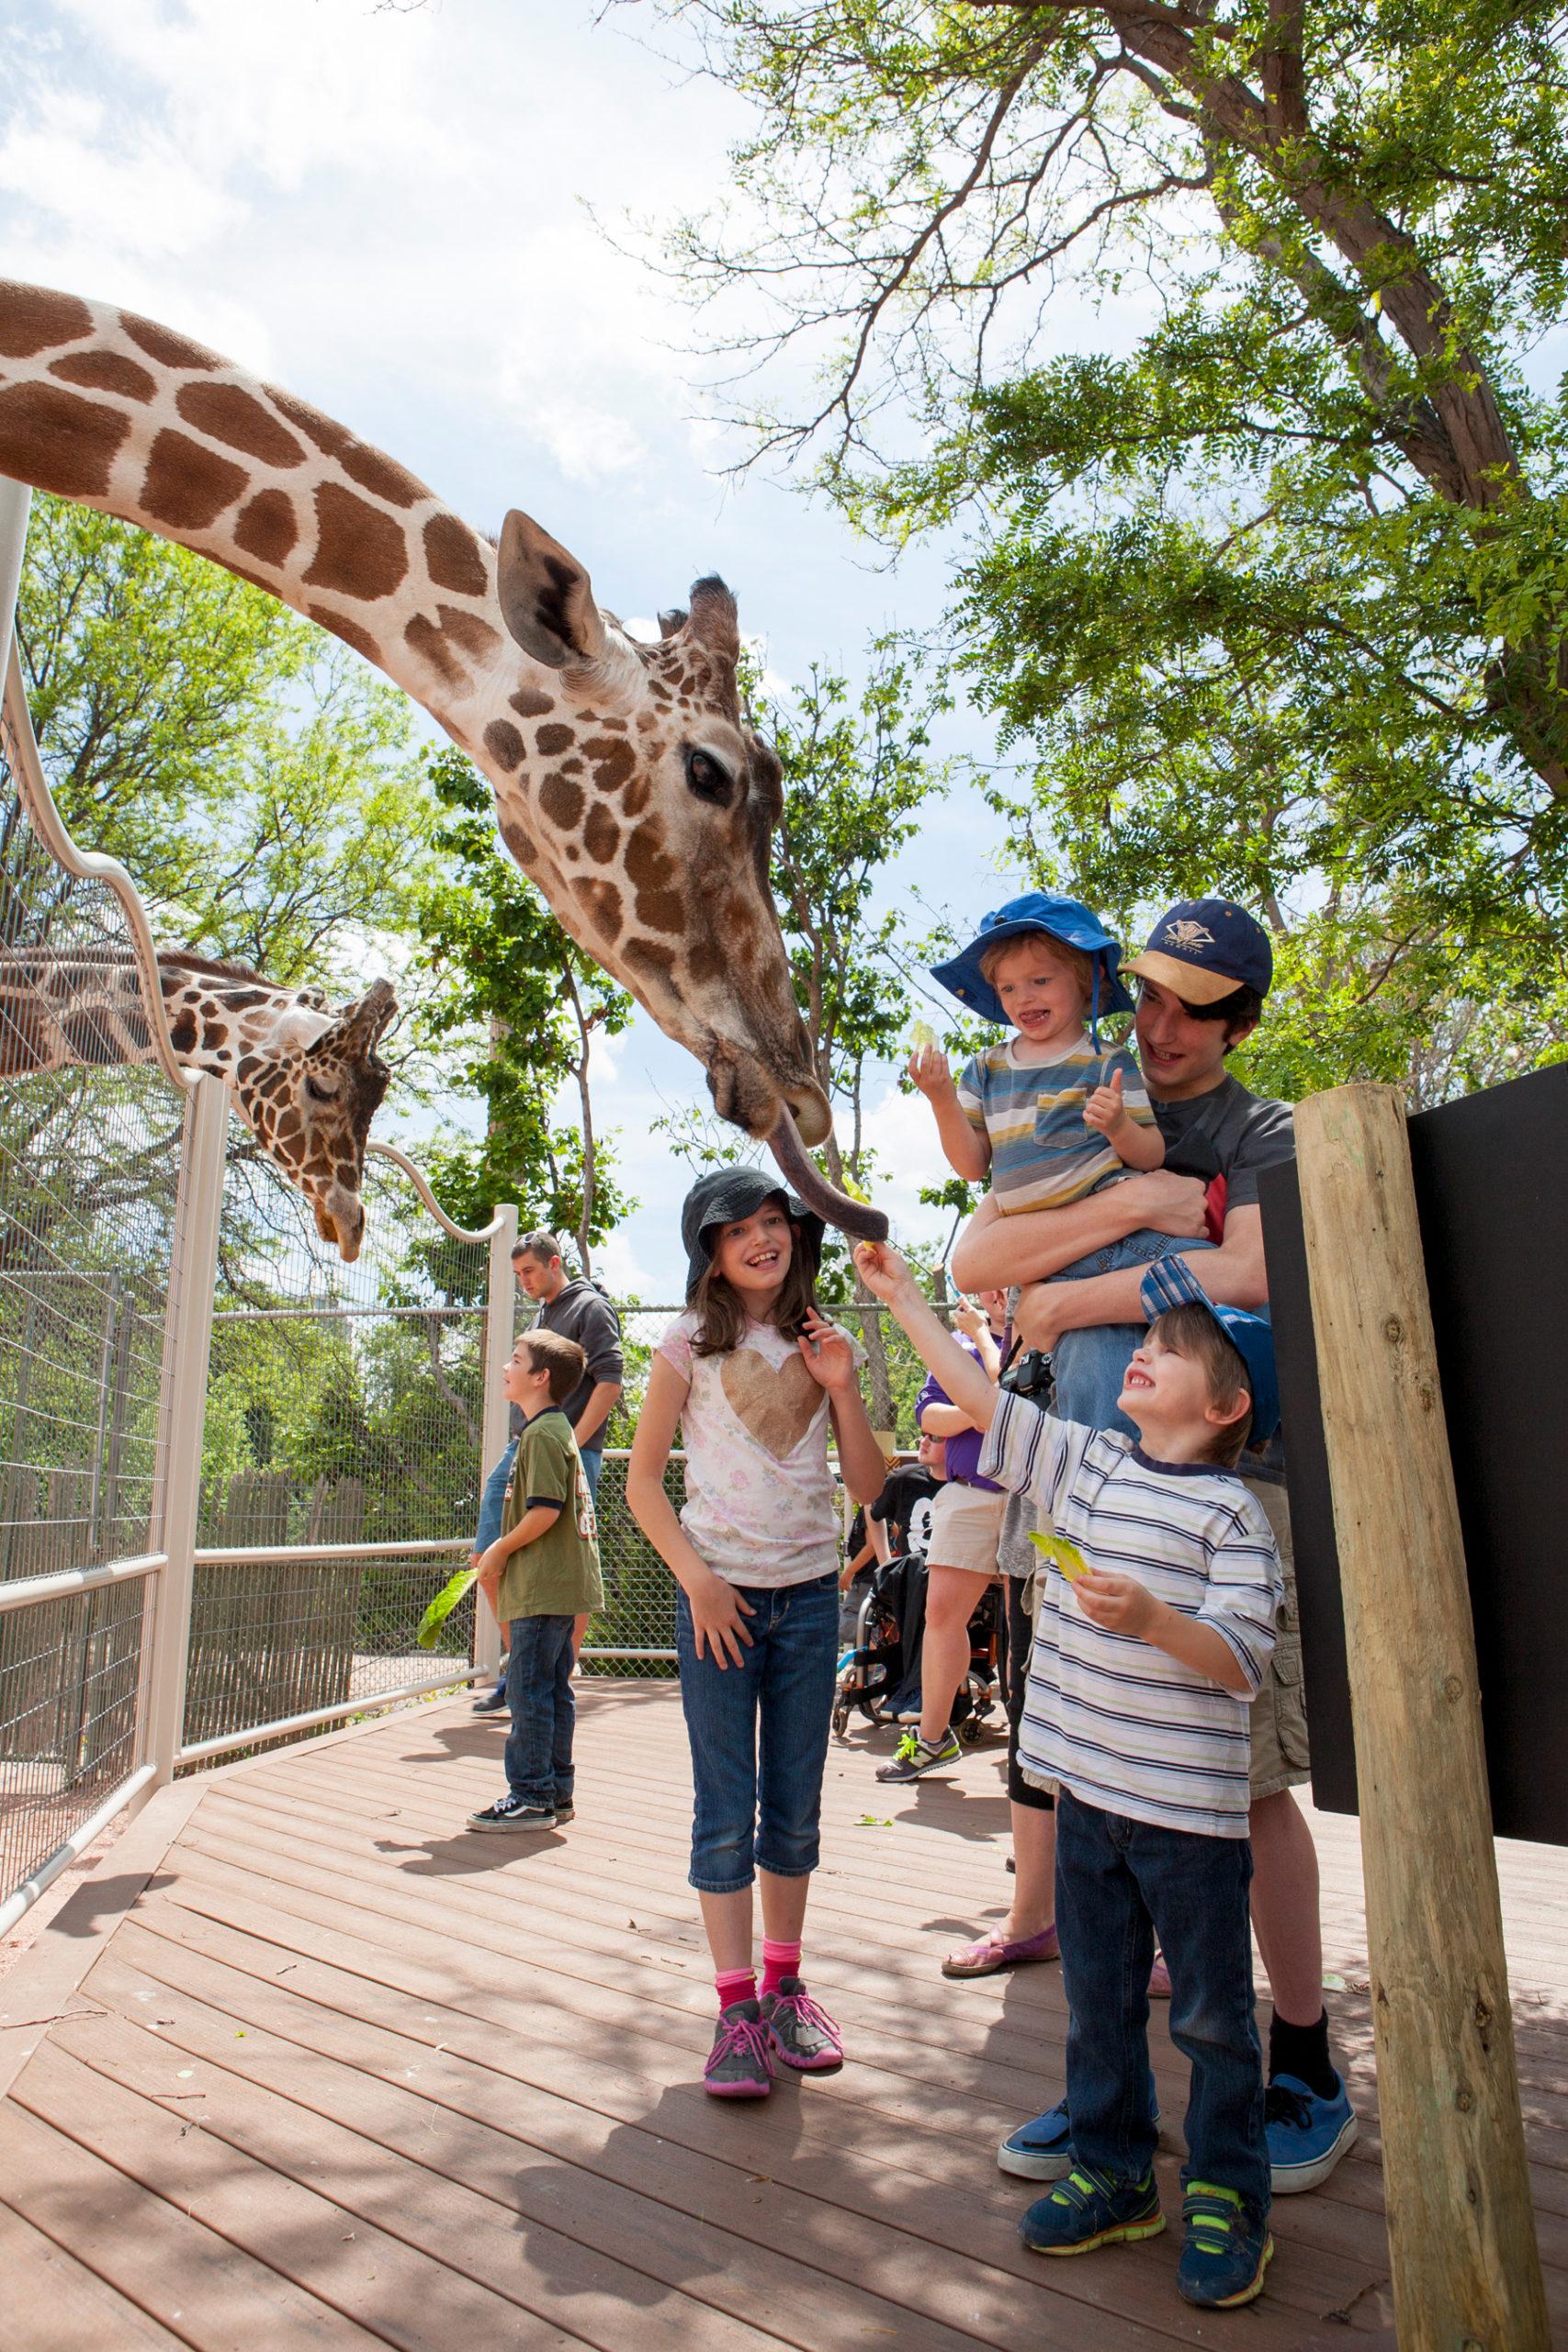 Feeding giraffes at the Denver Zoo